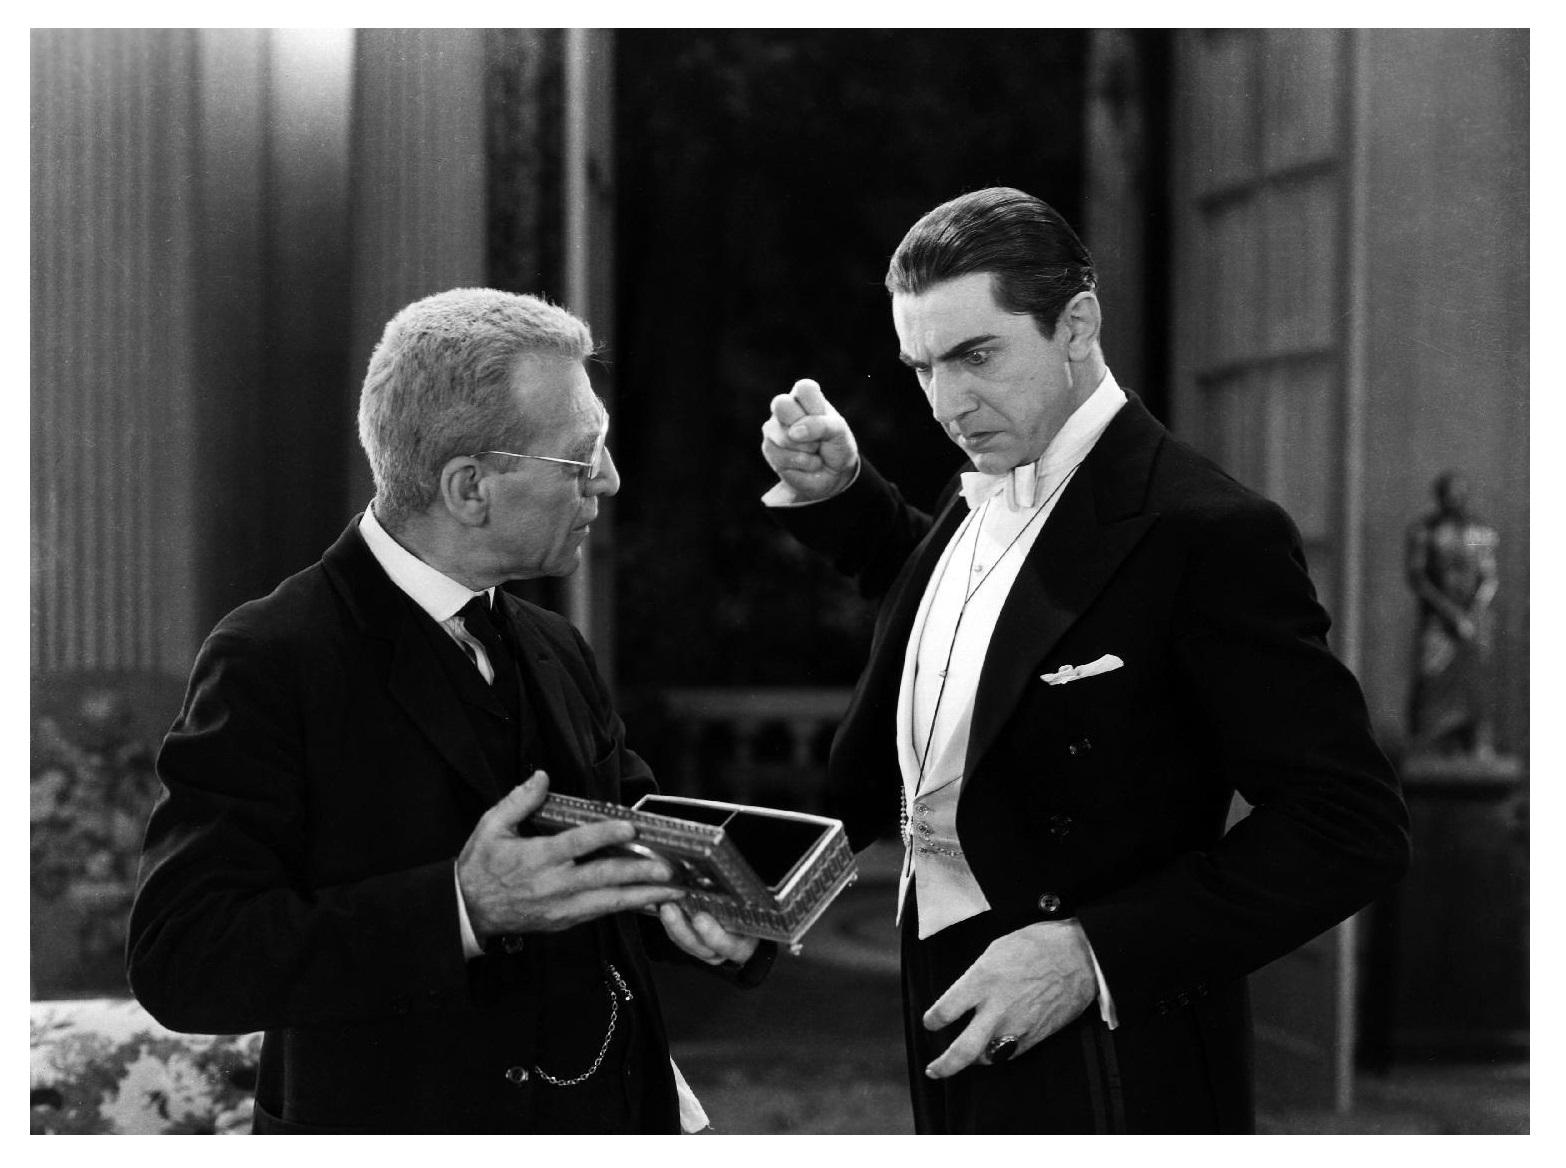 Dracula Edward Van Sloan and Bela Lugosi